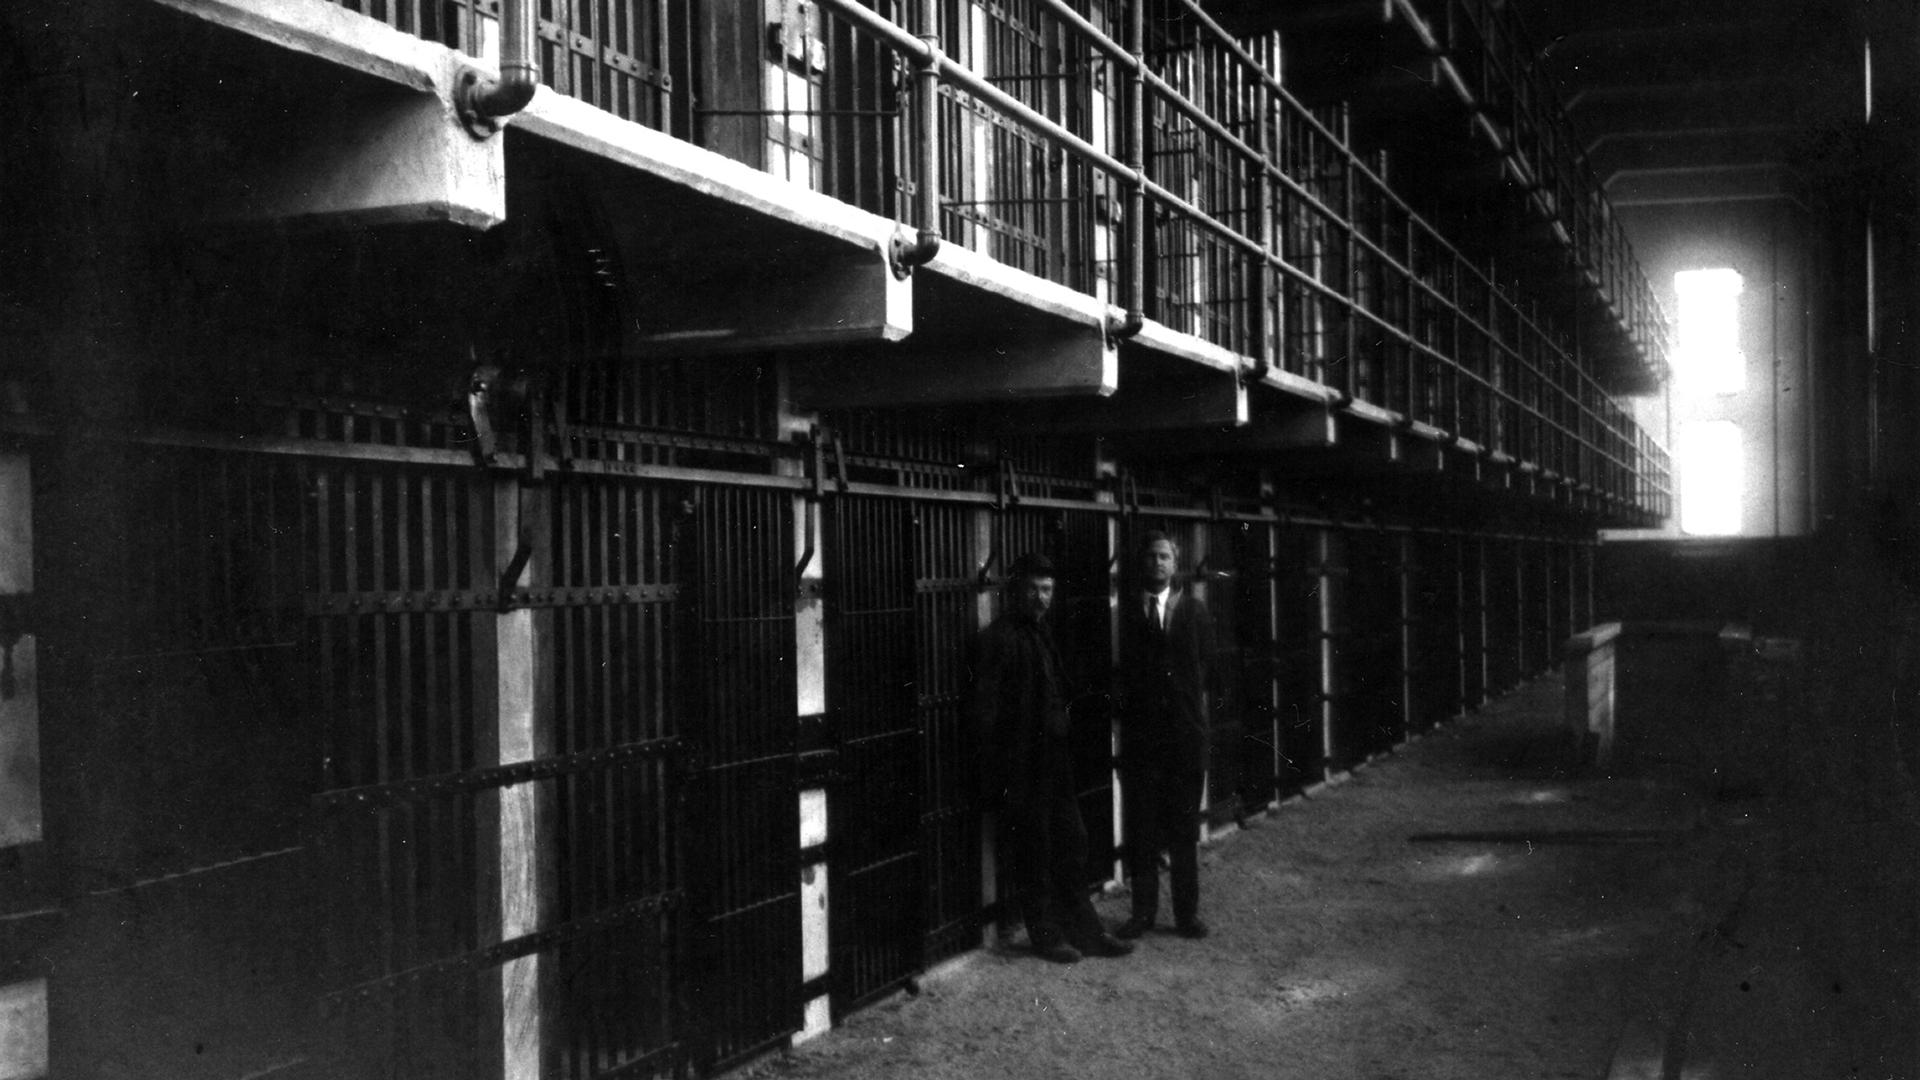 The Gruesome Murders at Alcatraz